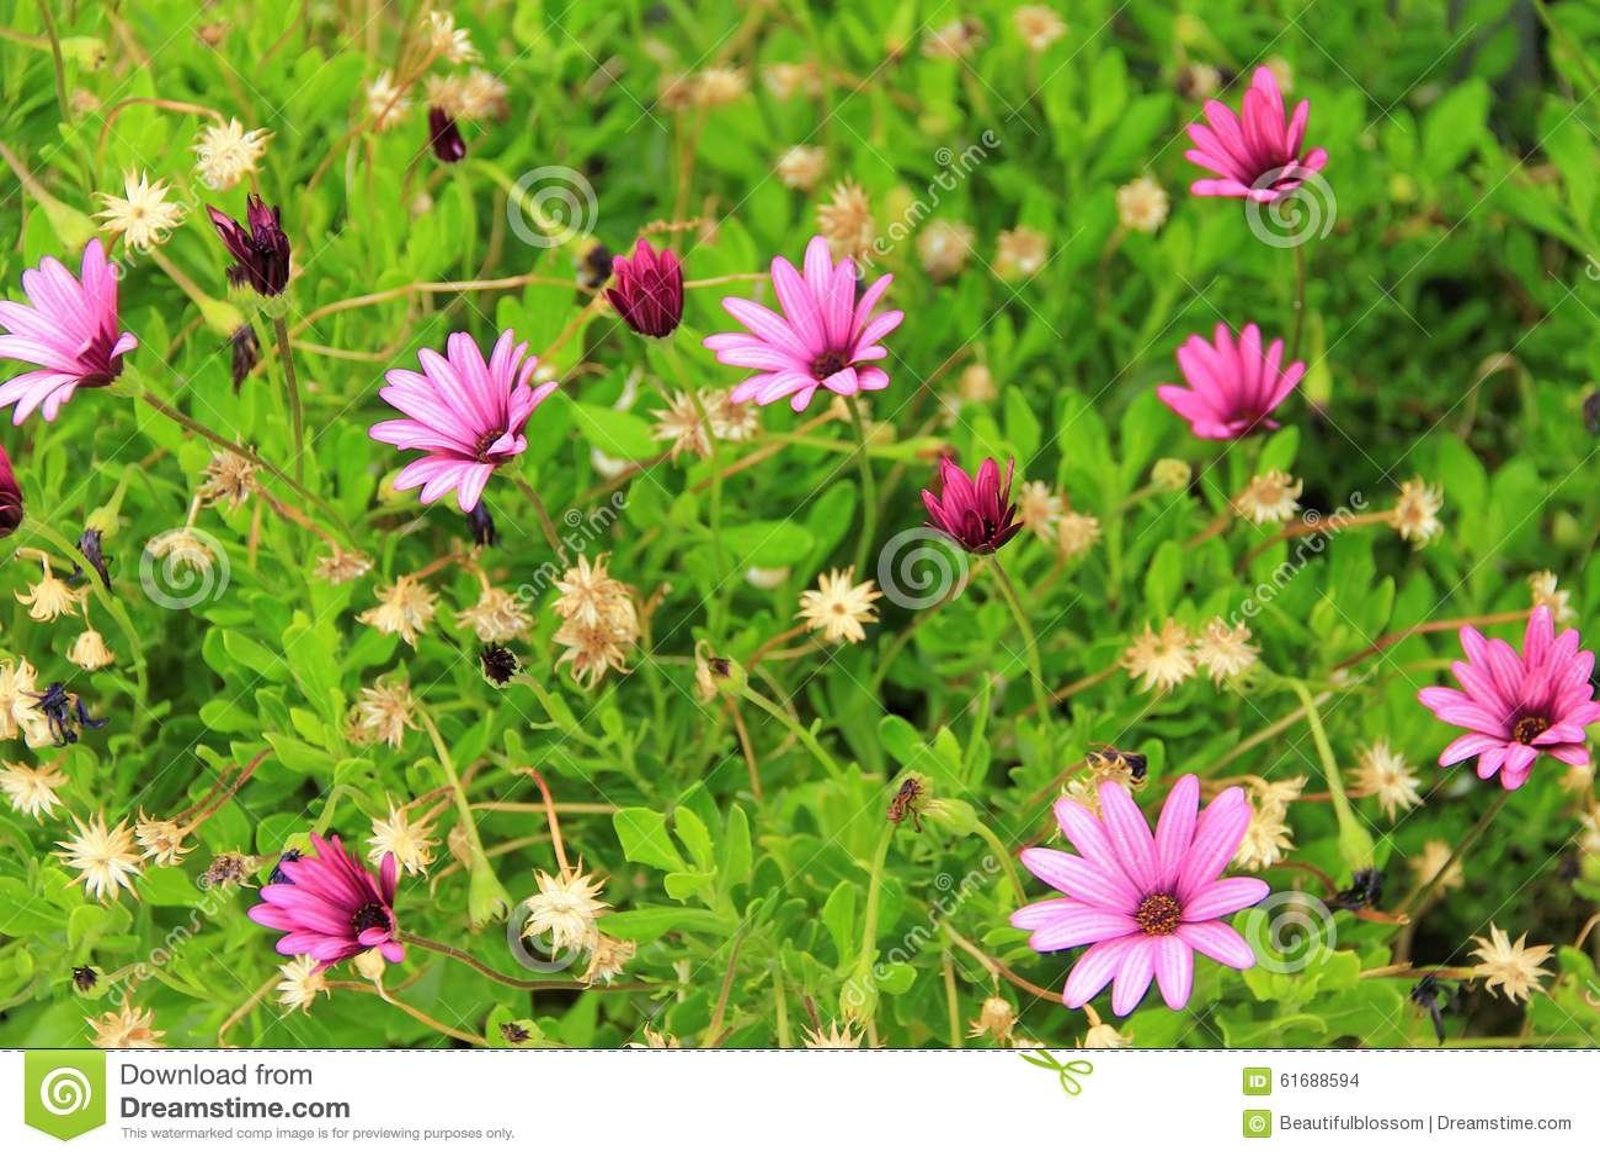 Small Purple Wild Flowers Stock Photo Image Of Meadow 61688594